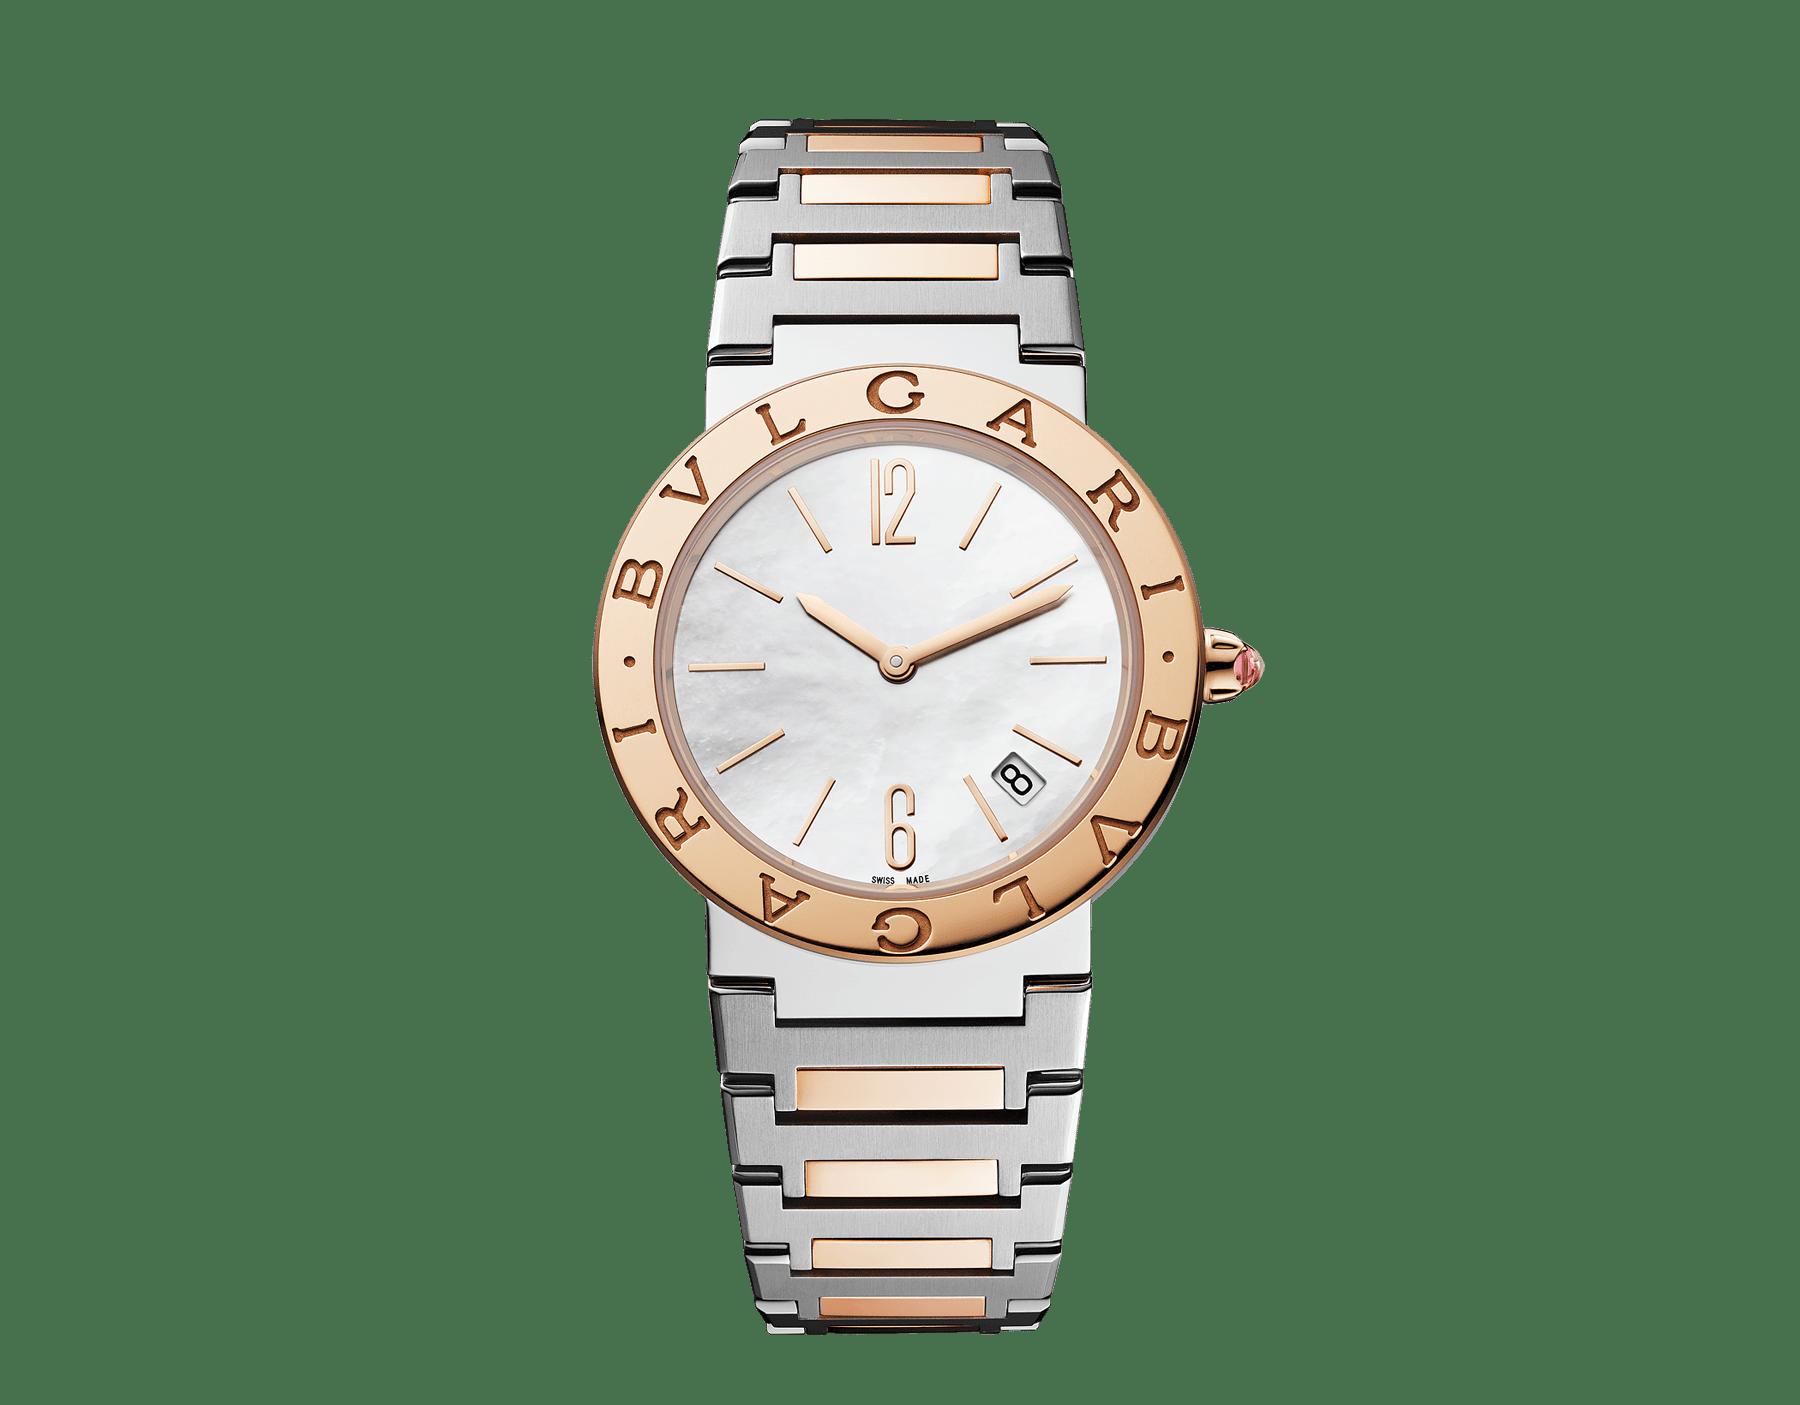 BVLGARI BVLGARI LADY腕表,精钢表壳,18K玫瑰金表圈镌刻双logo标志,白色珍珠母贝表盘,18K玫瑰金和精钢表链 102925 image 1